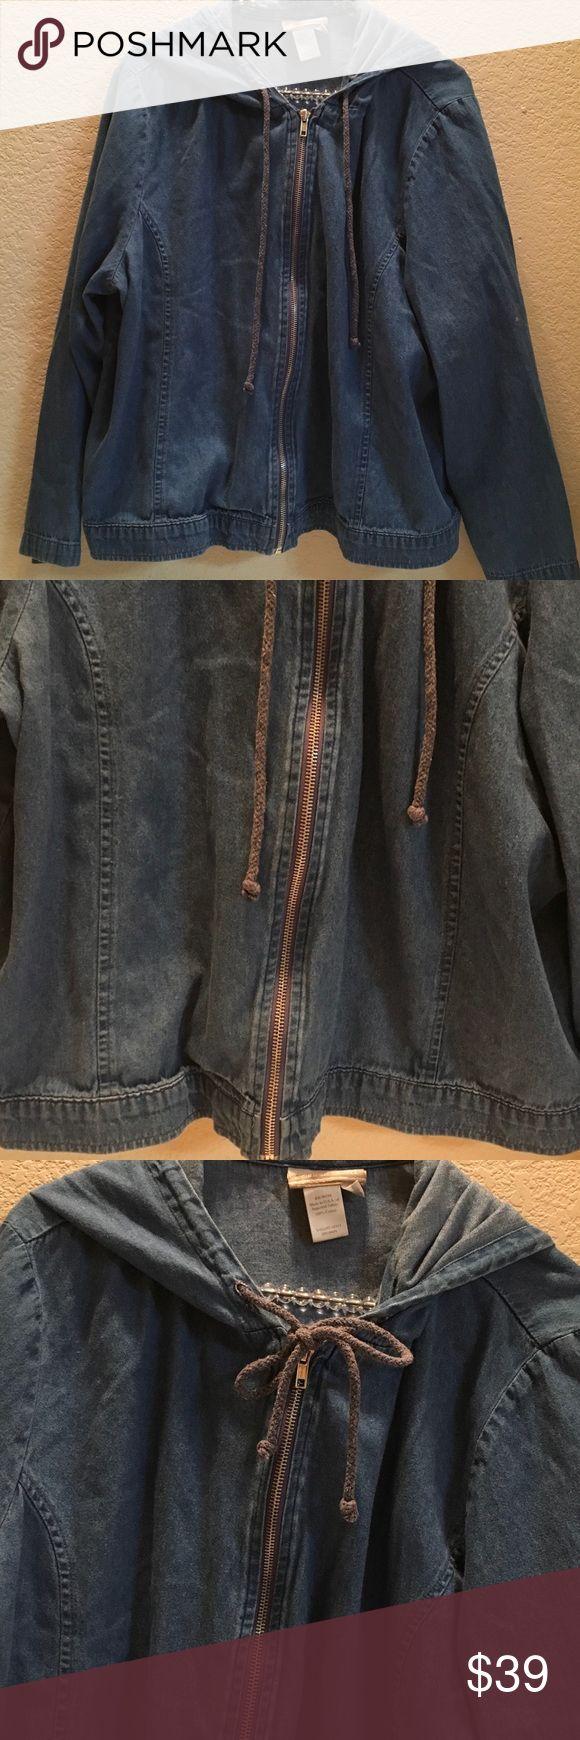 "COLDWATER CREK Medium Denim wash zipup hoody PL Great versatile zip up jacket ties at neckline. Medium wash denim, long sleeved hoody Seams ru. Down front sides for flattering fit. 100% Cotton, no pockets... PETITE LARGE PL...23 3/4"" pit - pit.....22""shoulder - edge.  Very good condition. 🍁🎂🍁🎂🍁🎂 Coldwater Creek Jackets & Coats"